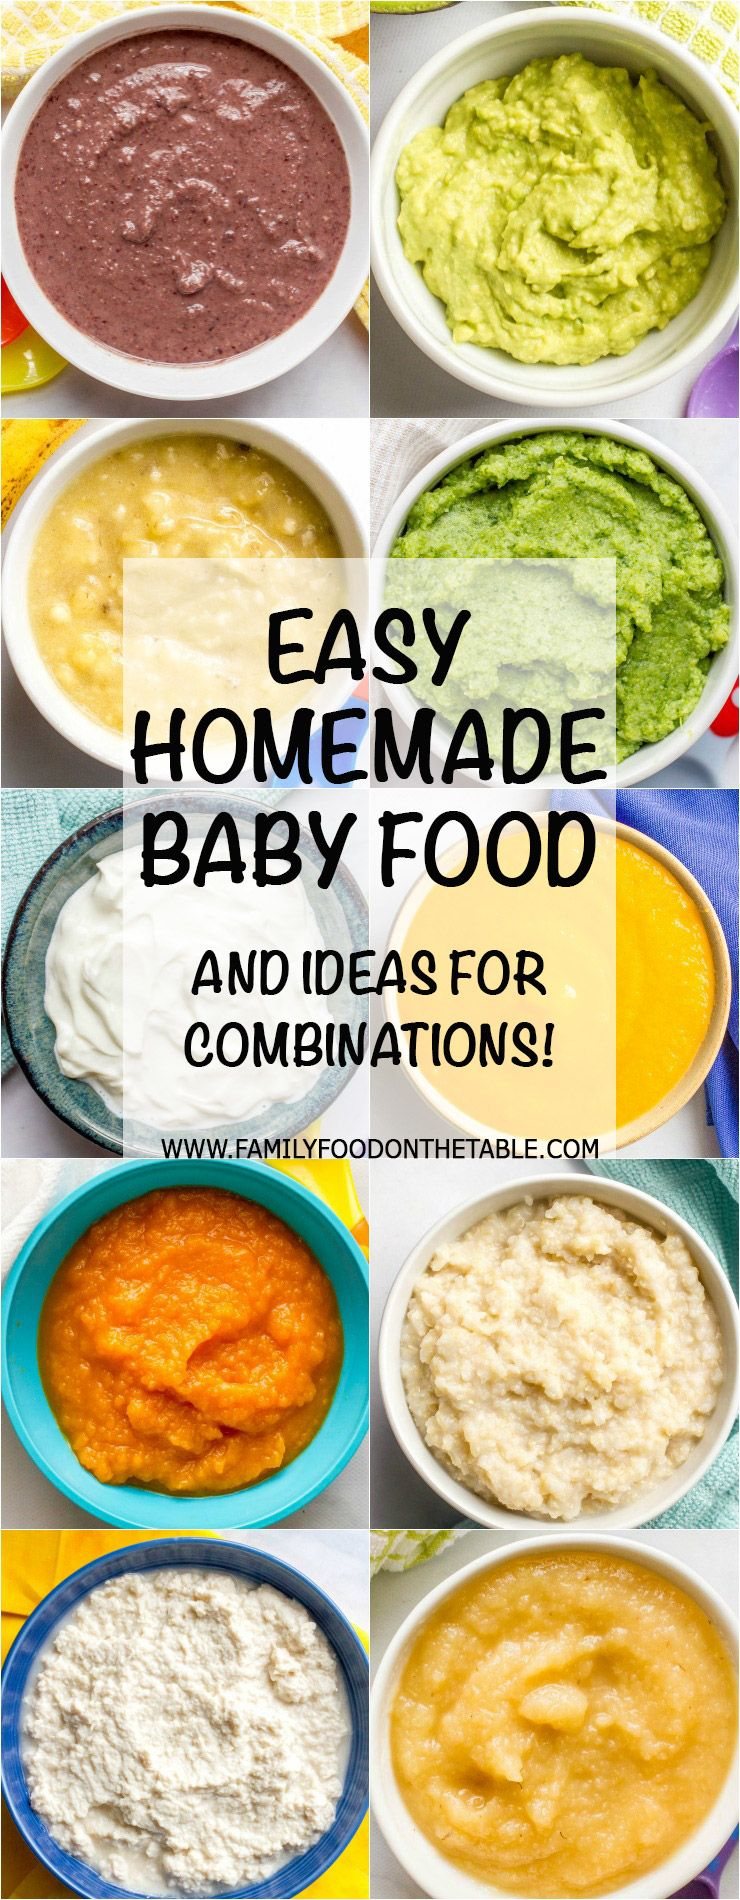 Homemade baby food combinations #homemadebabyfood